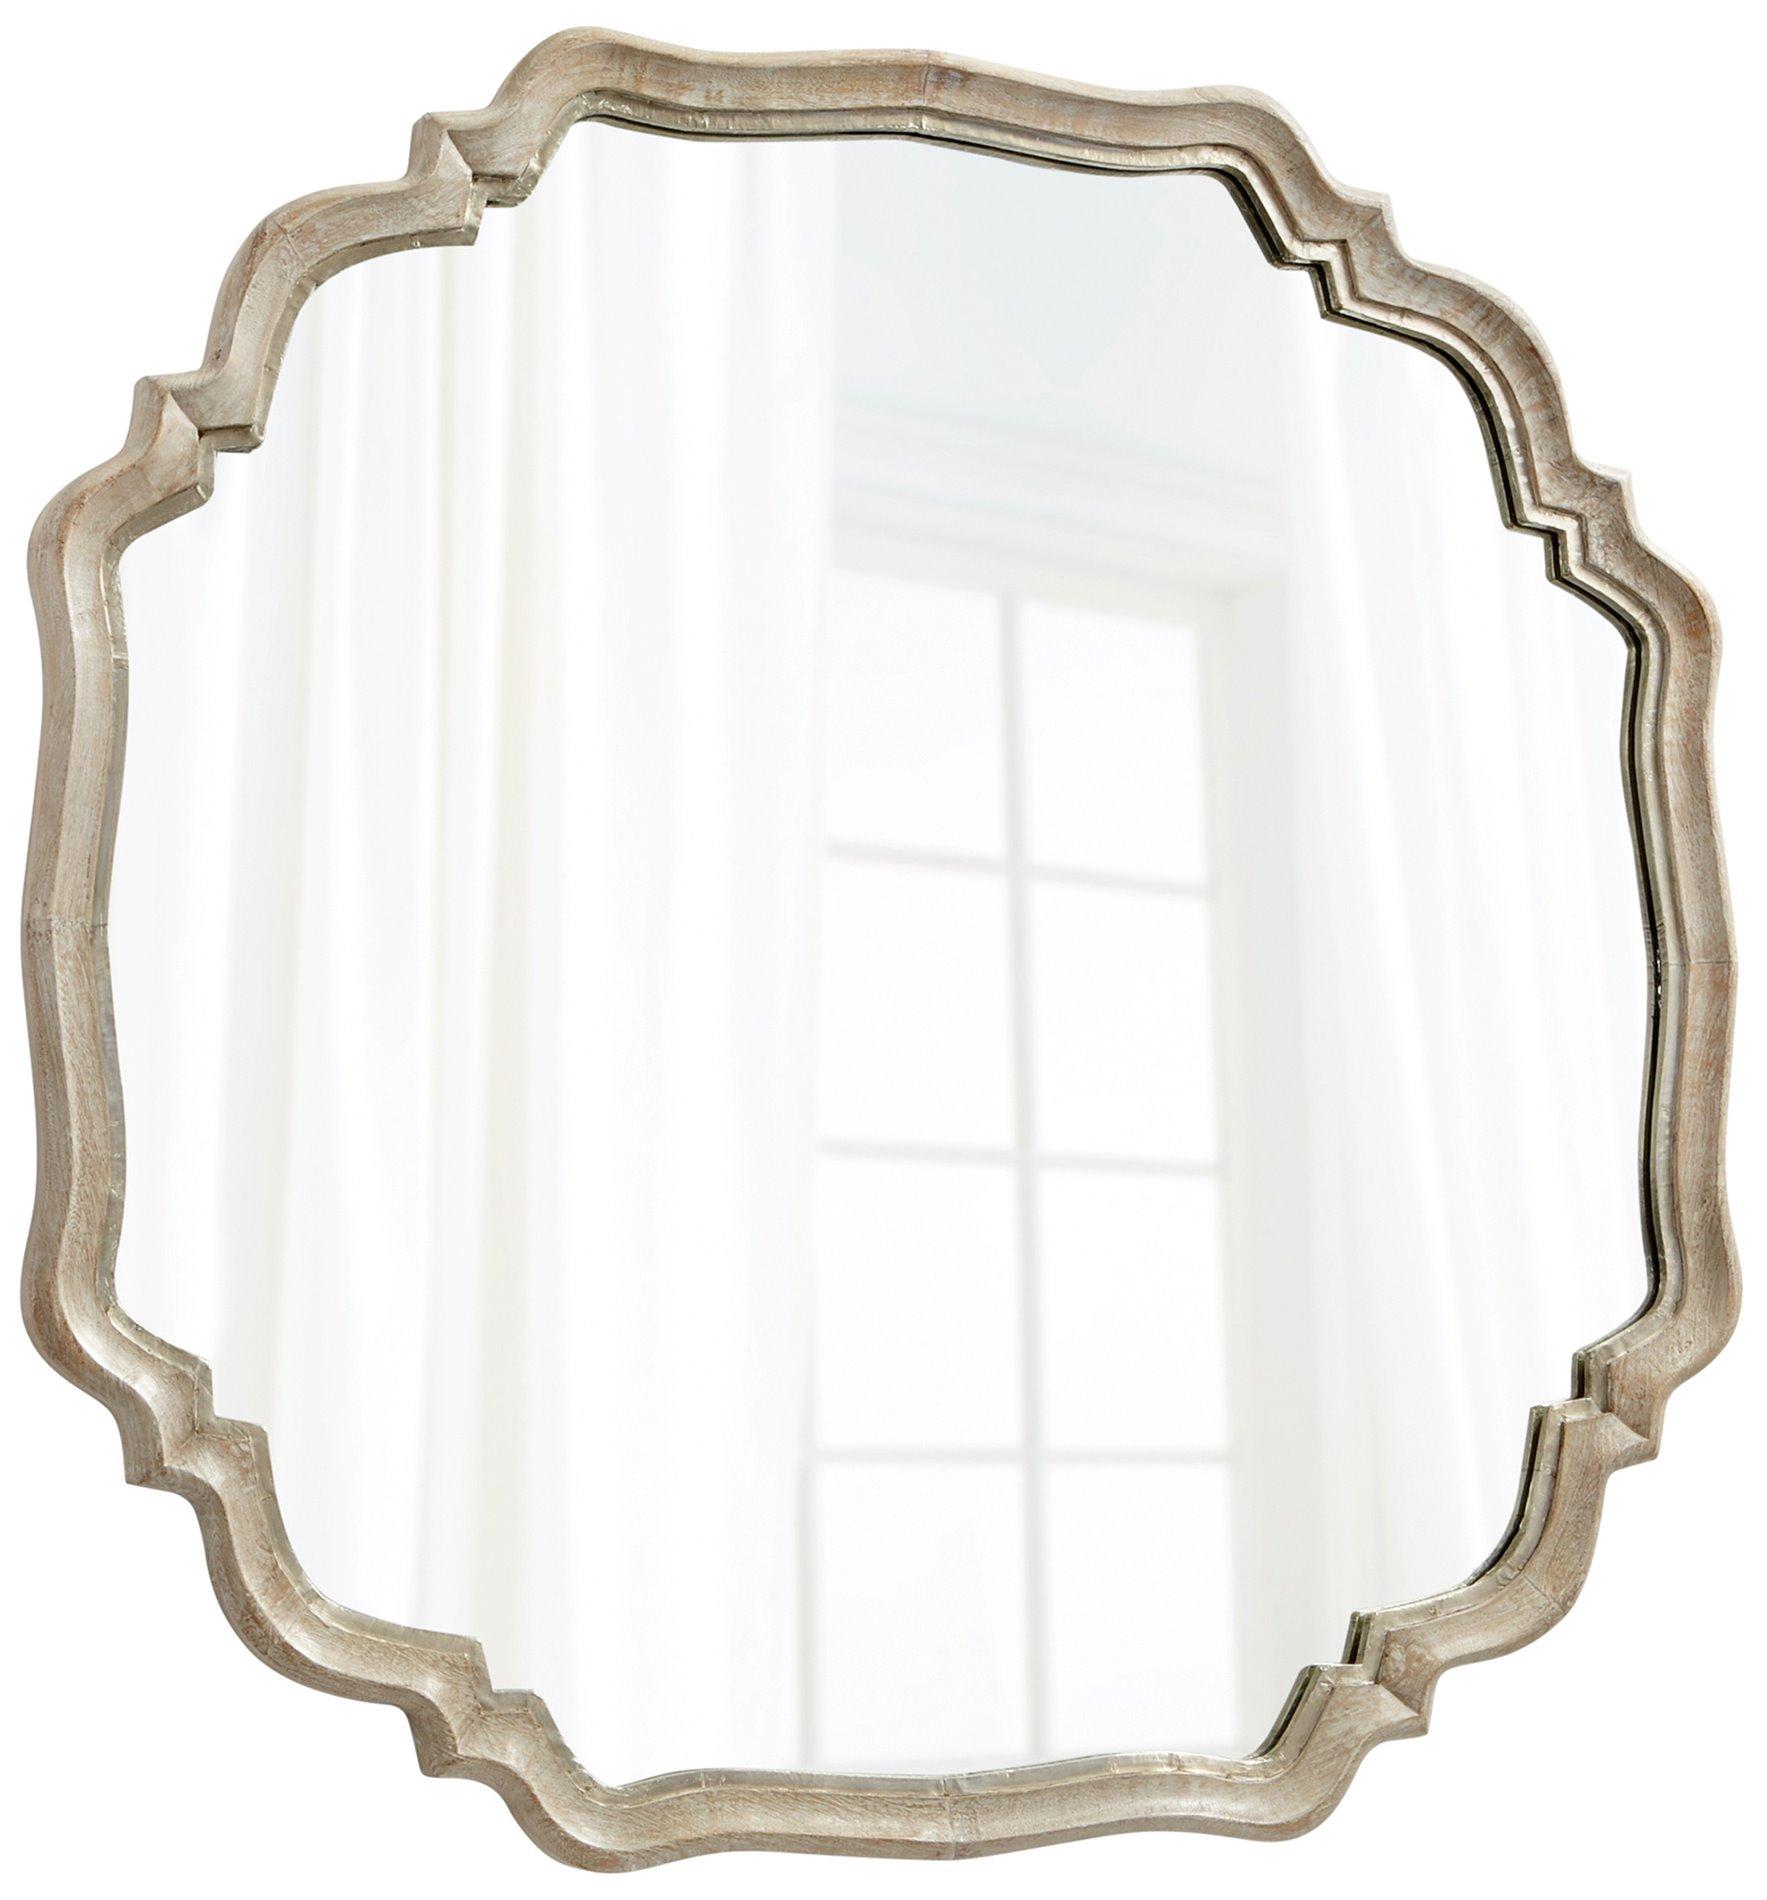 Cyan Design Medallion Mirror – Cn 08229 See Details (Image 8 of 20)